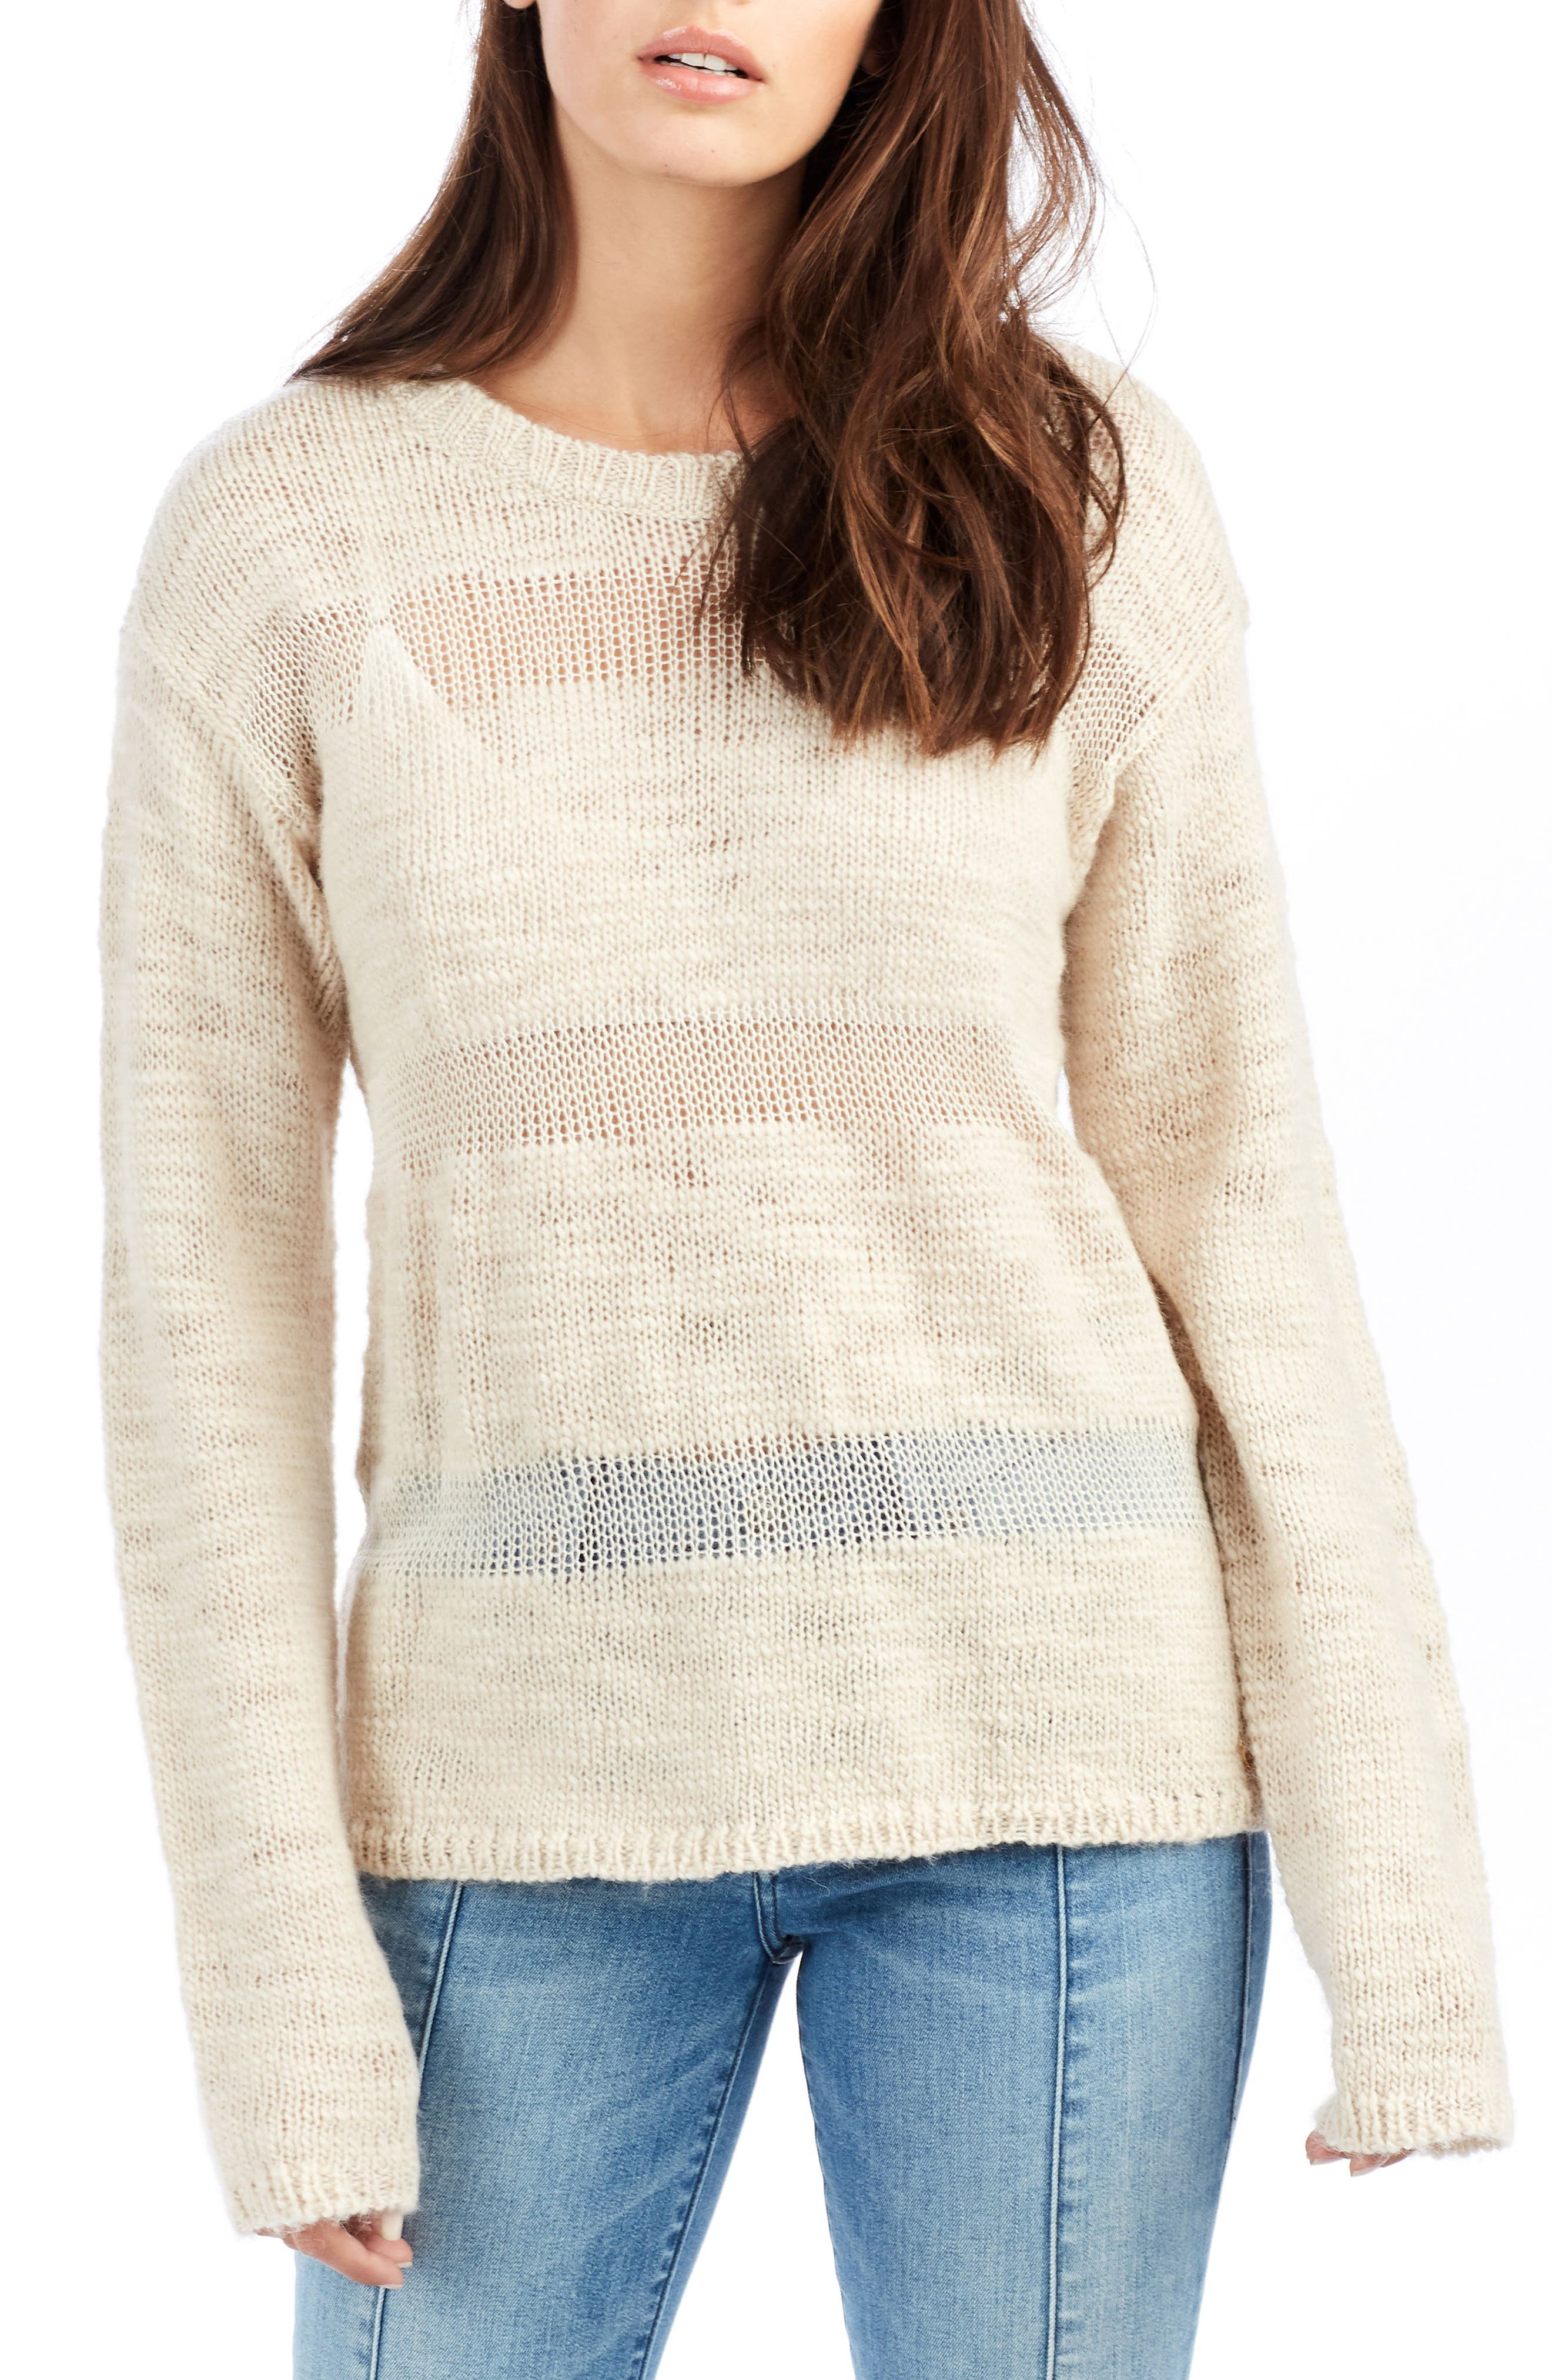 Main Image - True Religion Brand Jeans Stripe Sweater